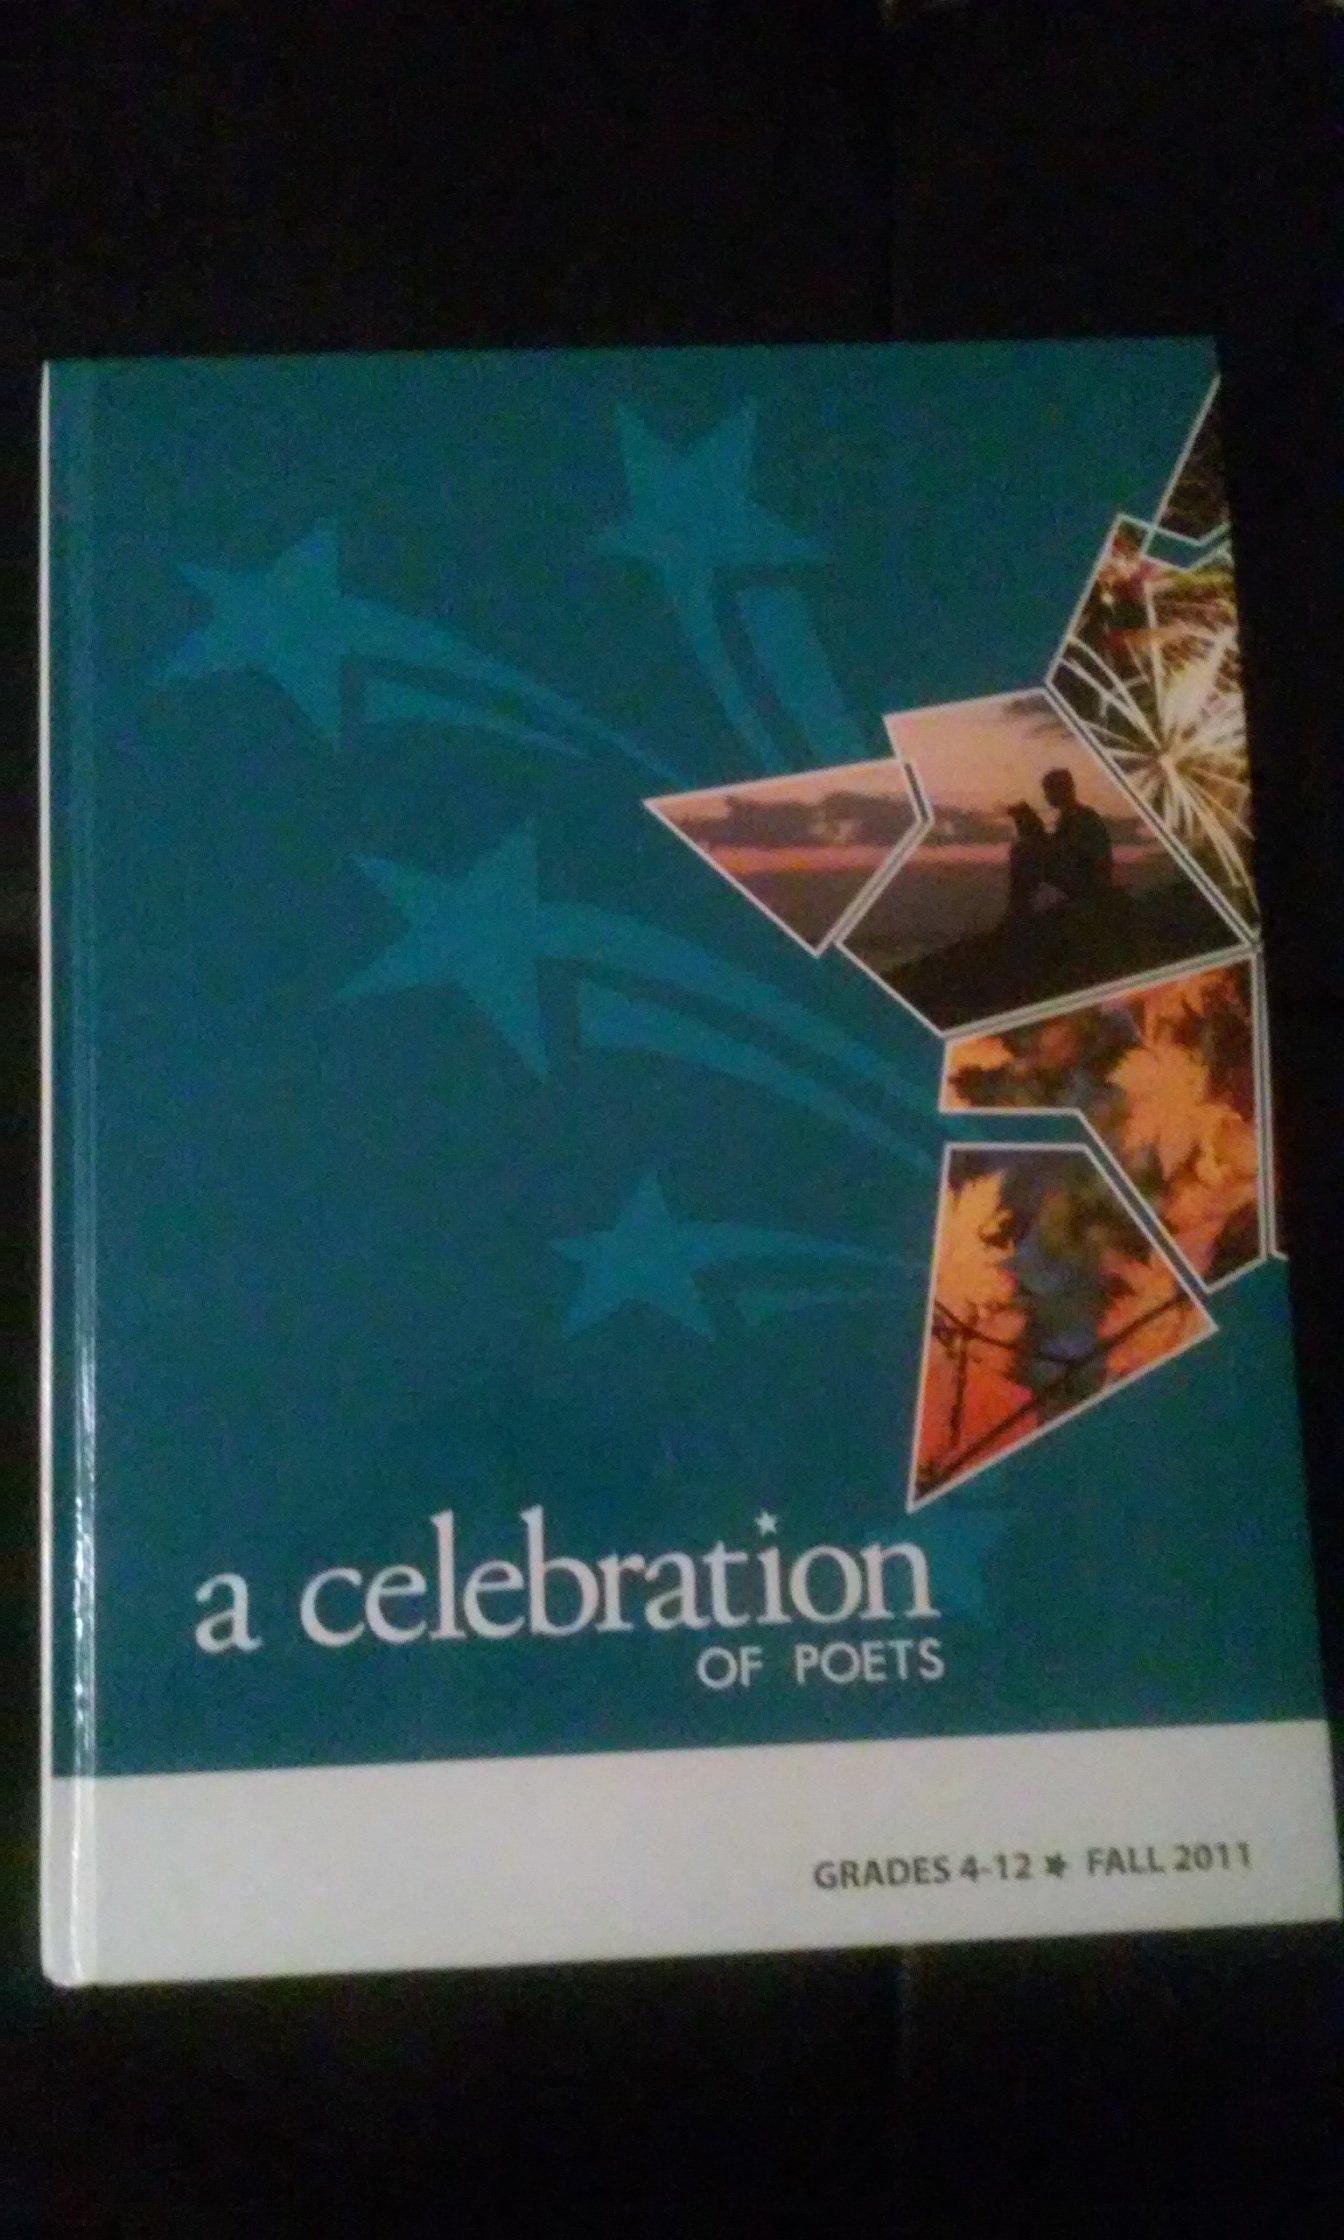 A Celebration of Poets - Grades 4-12 - Fall 2011 PDF